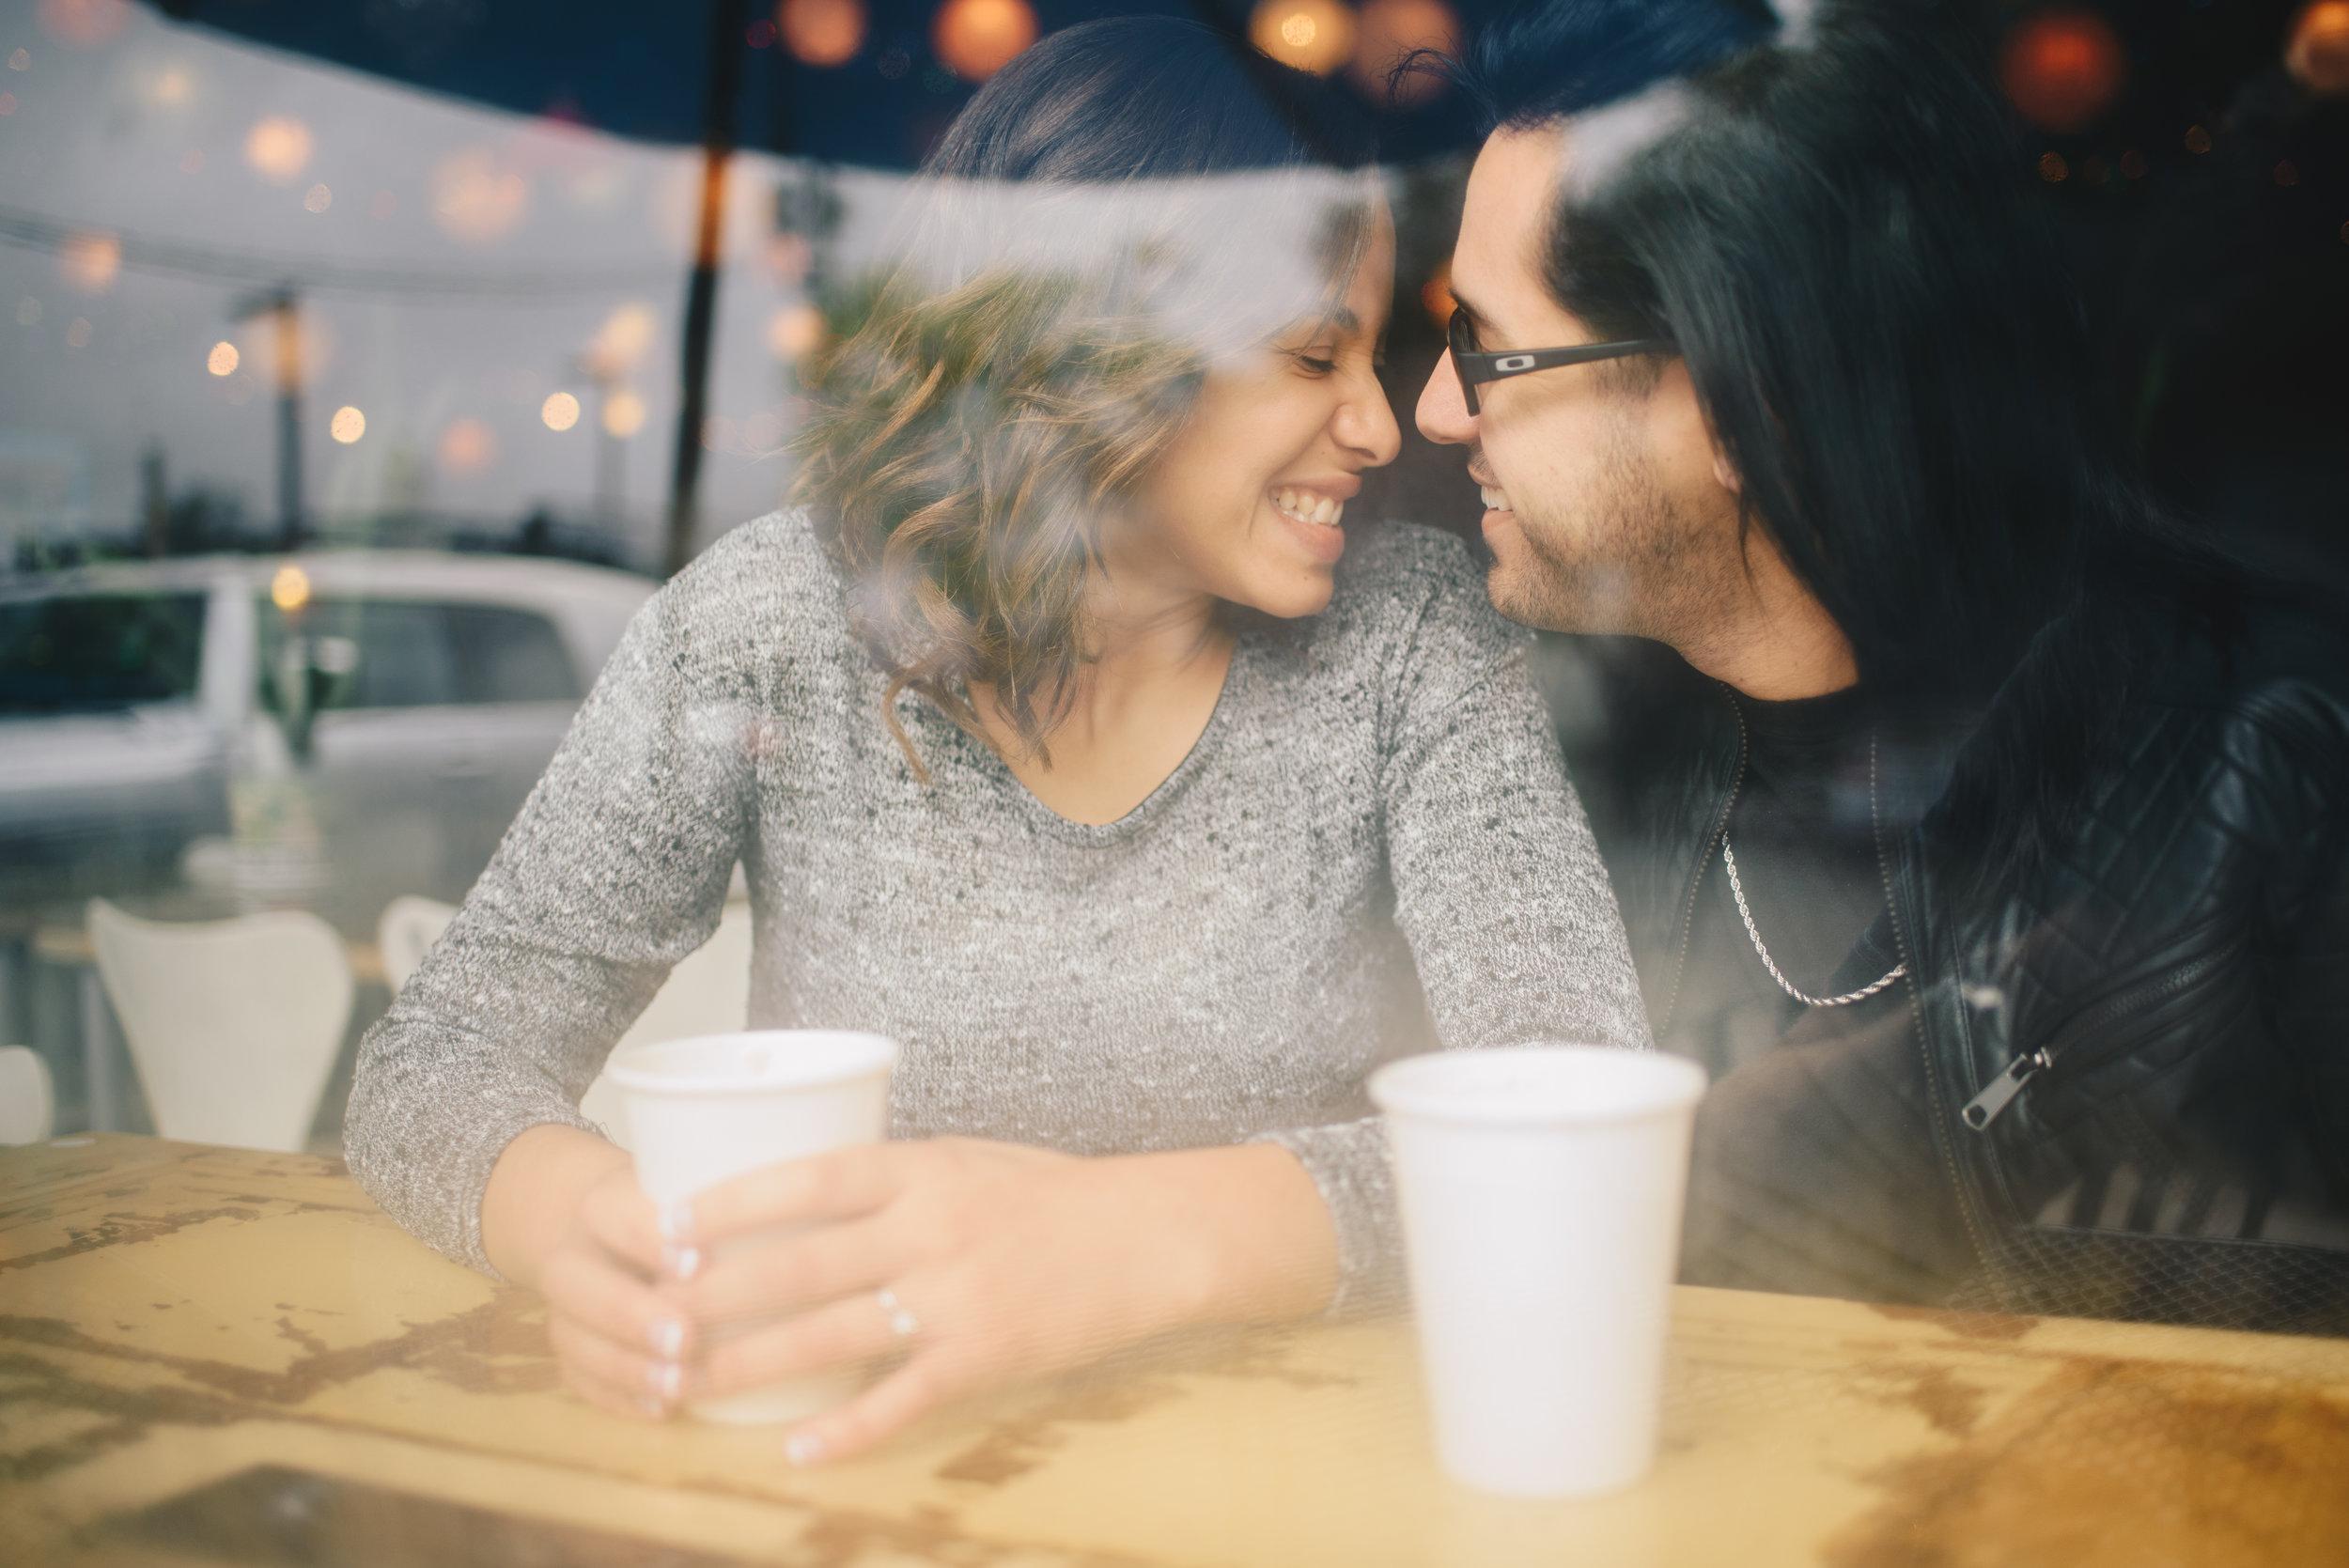 Los-Vargas-Photo-Central-Florida-Engagement-Coffee-Shop-Session-43.jpg